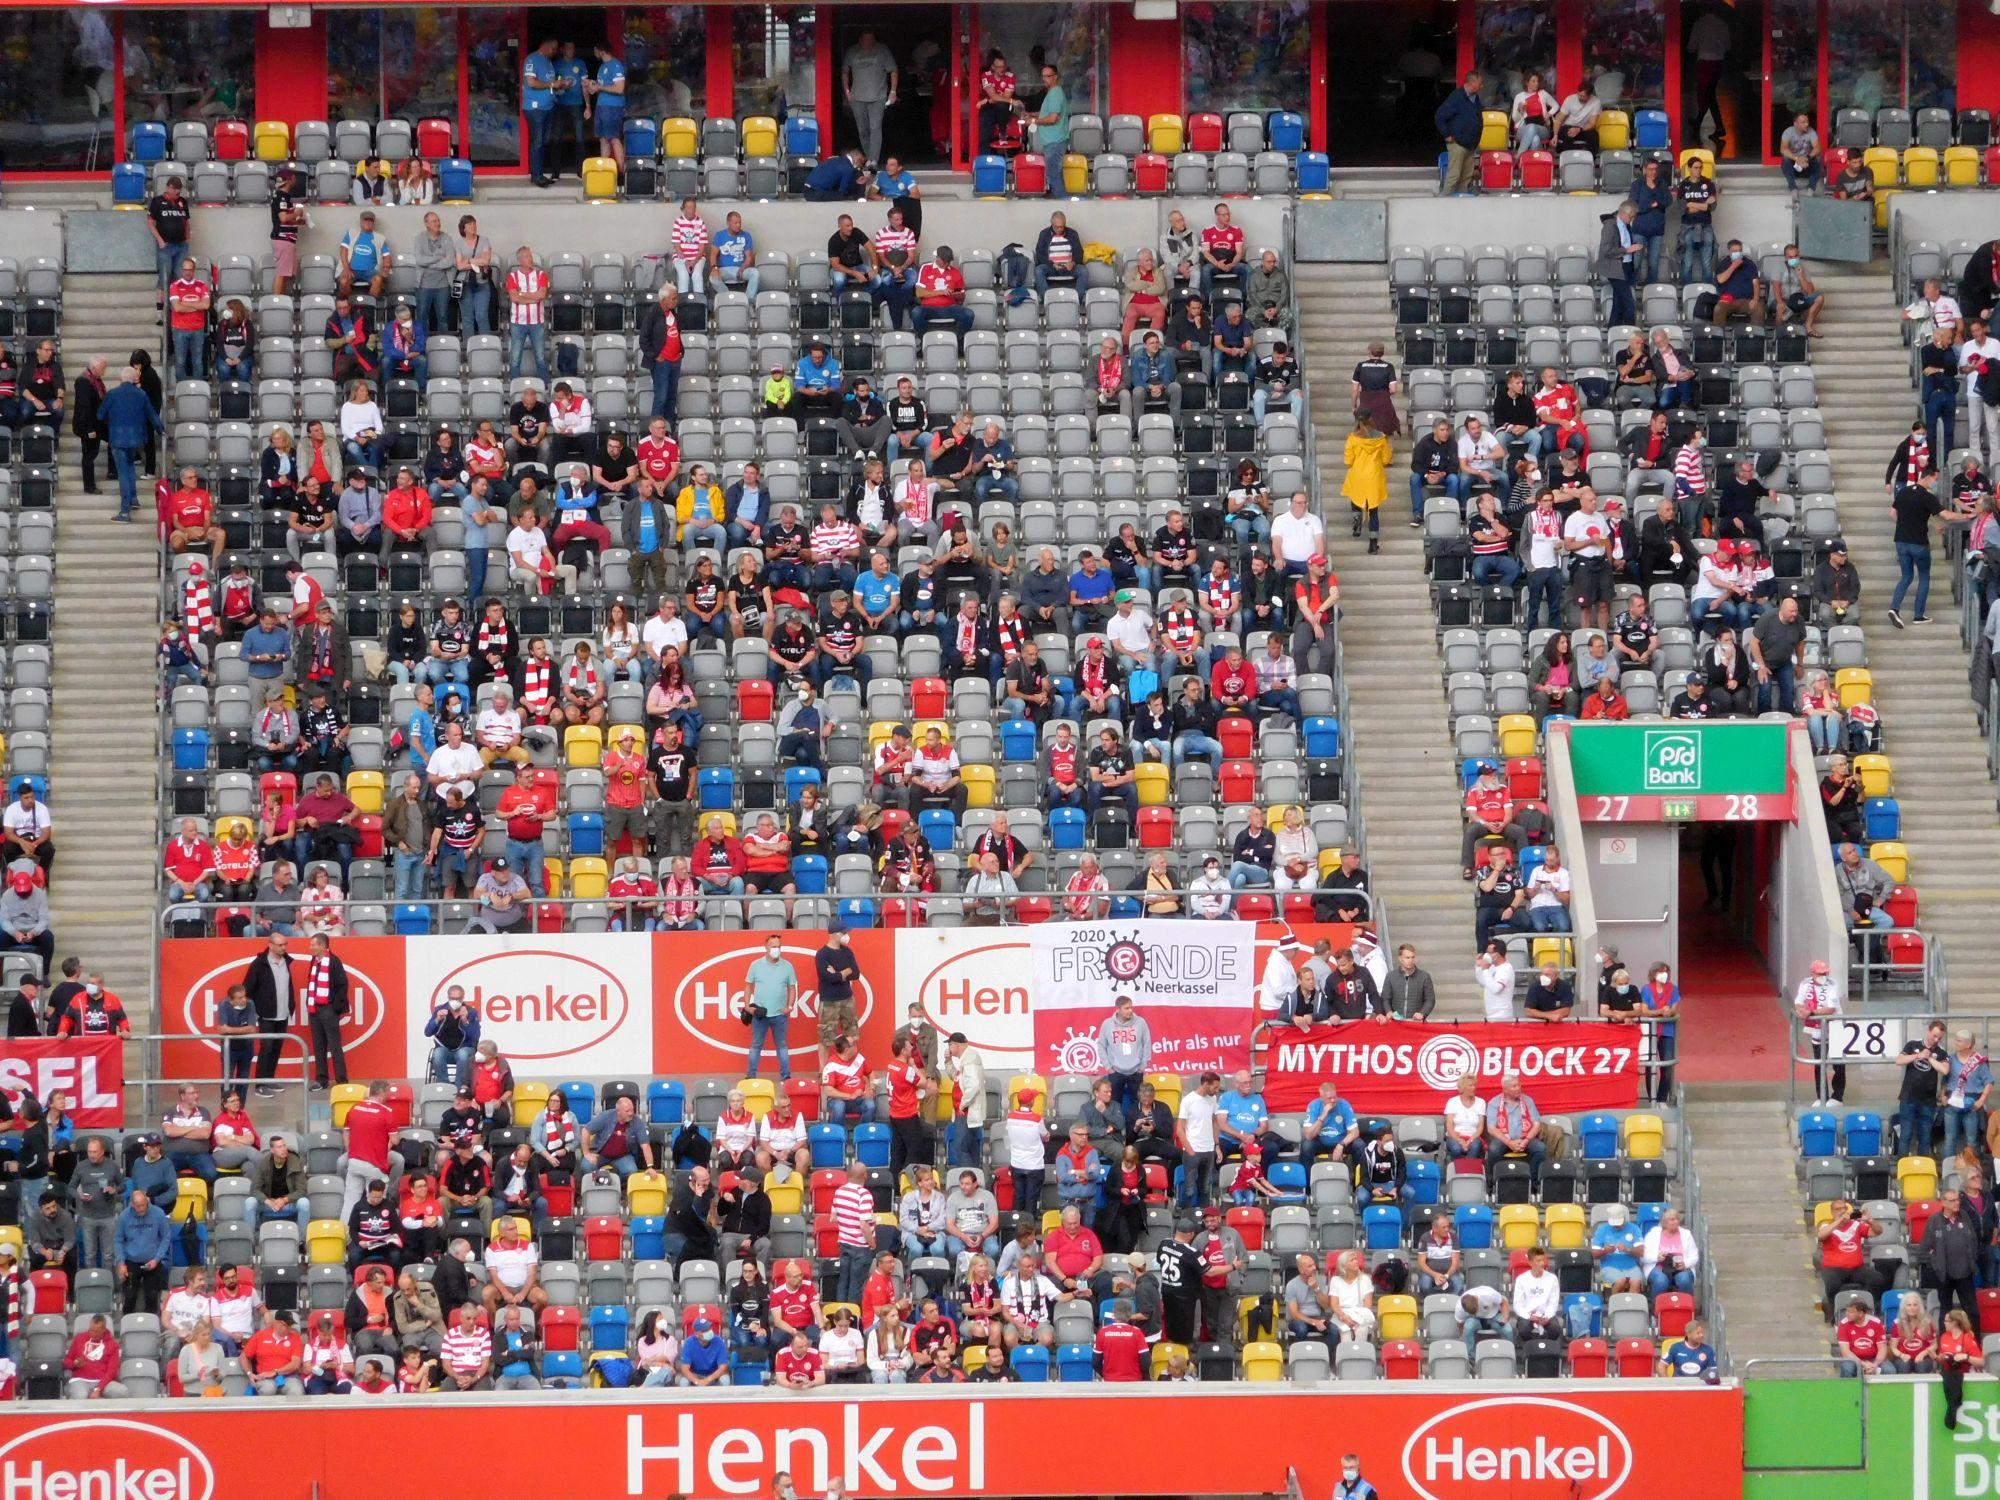 F95 vs Bremen: Block 27 - sah schon gut gefüllt aus (Foto: TD